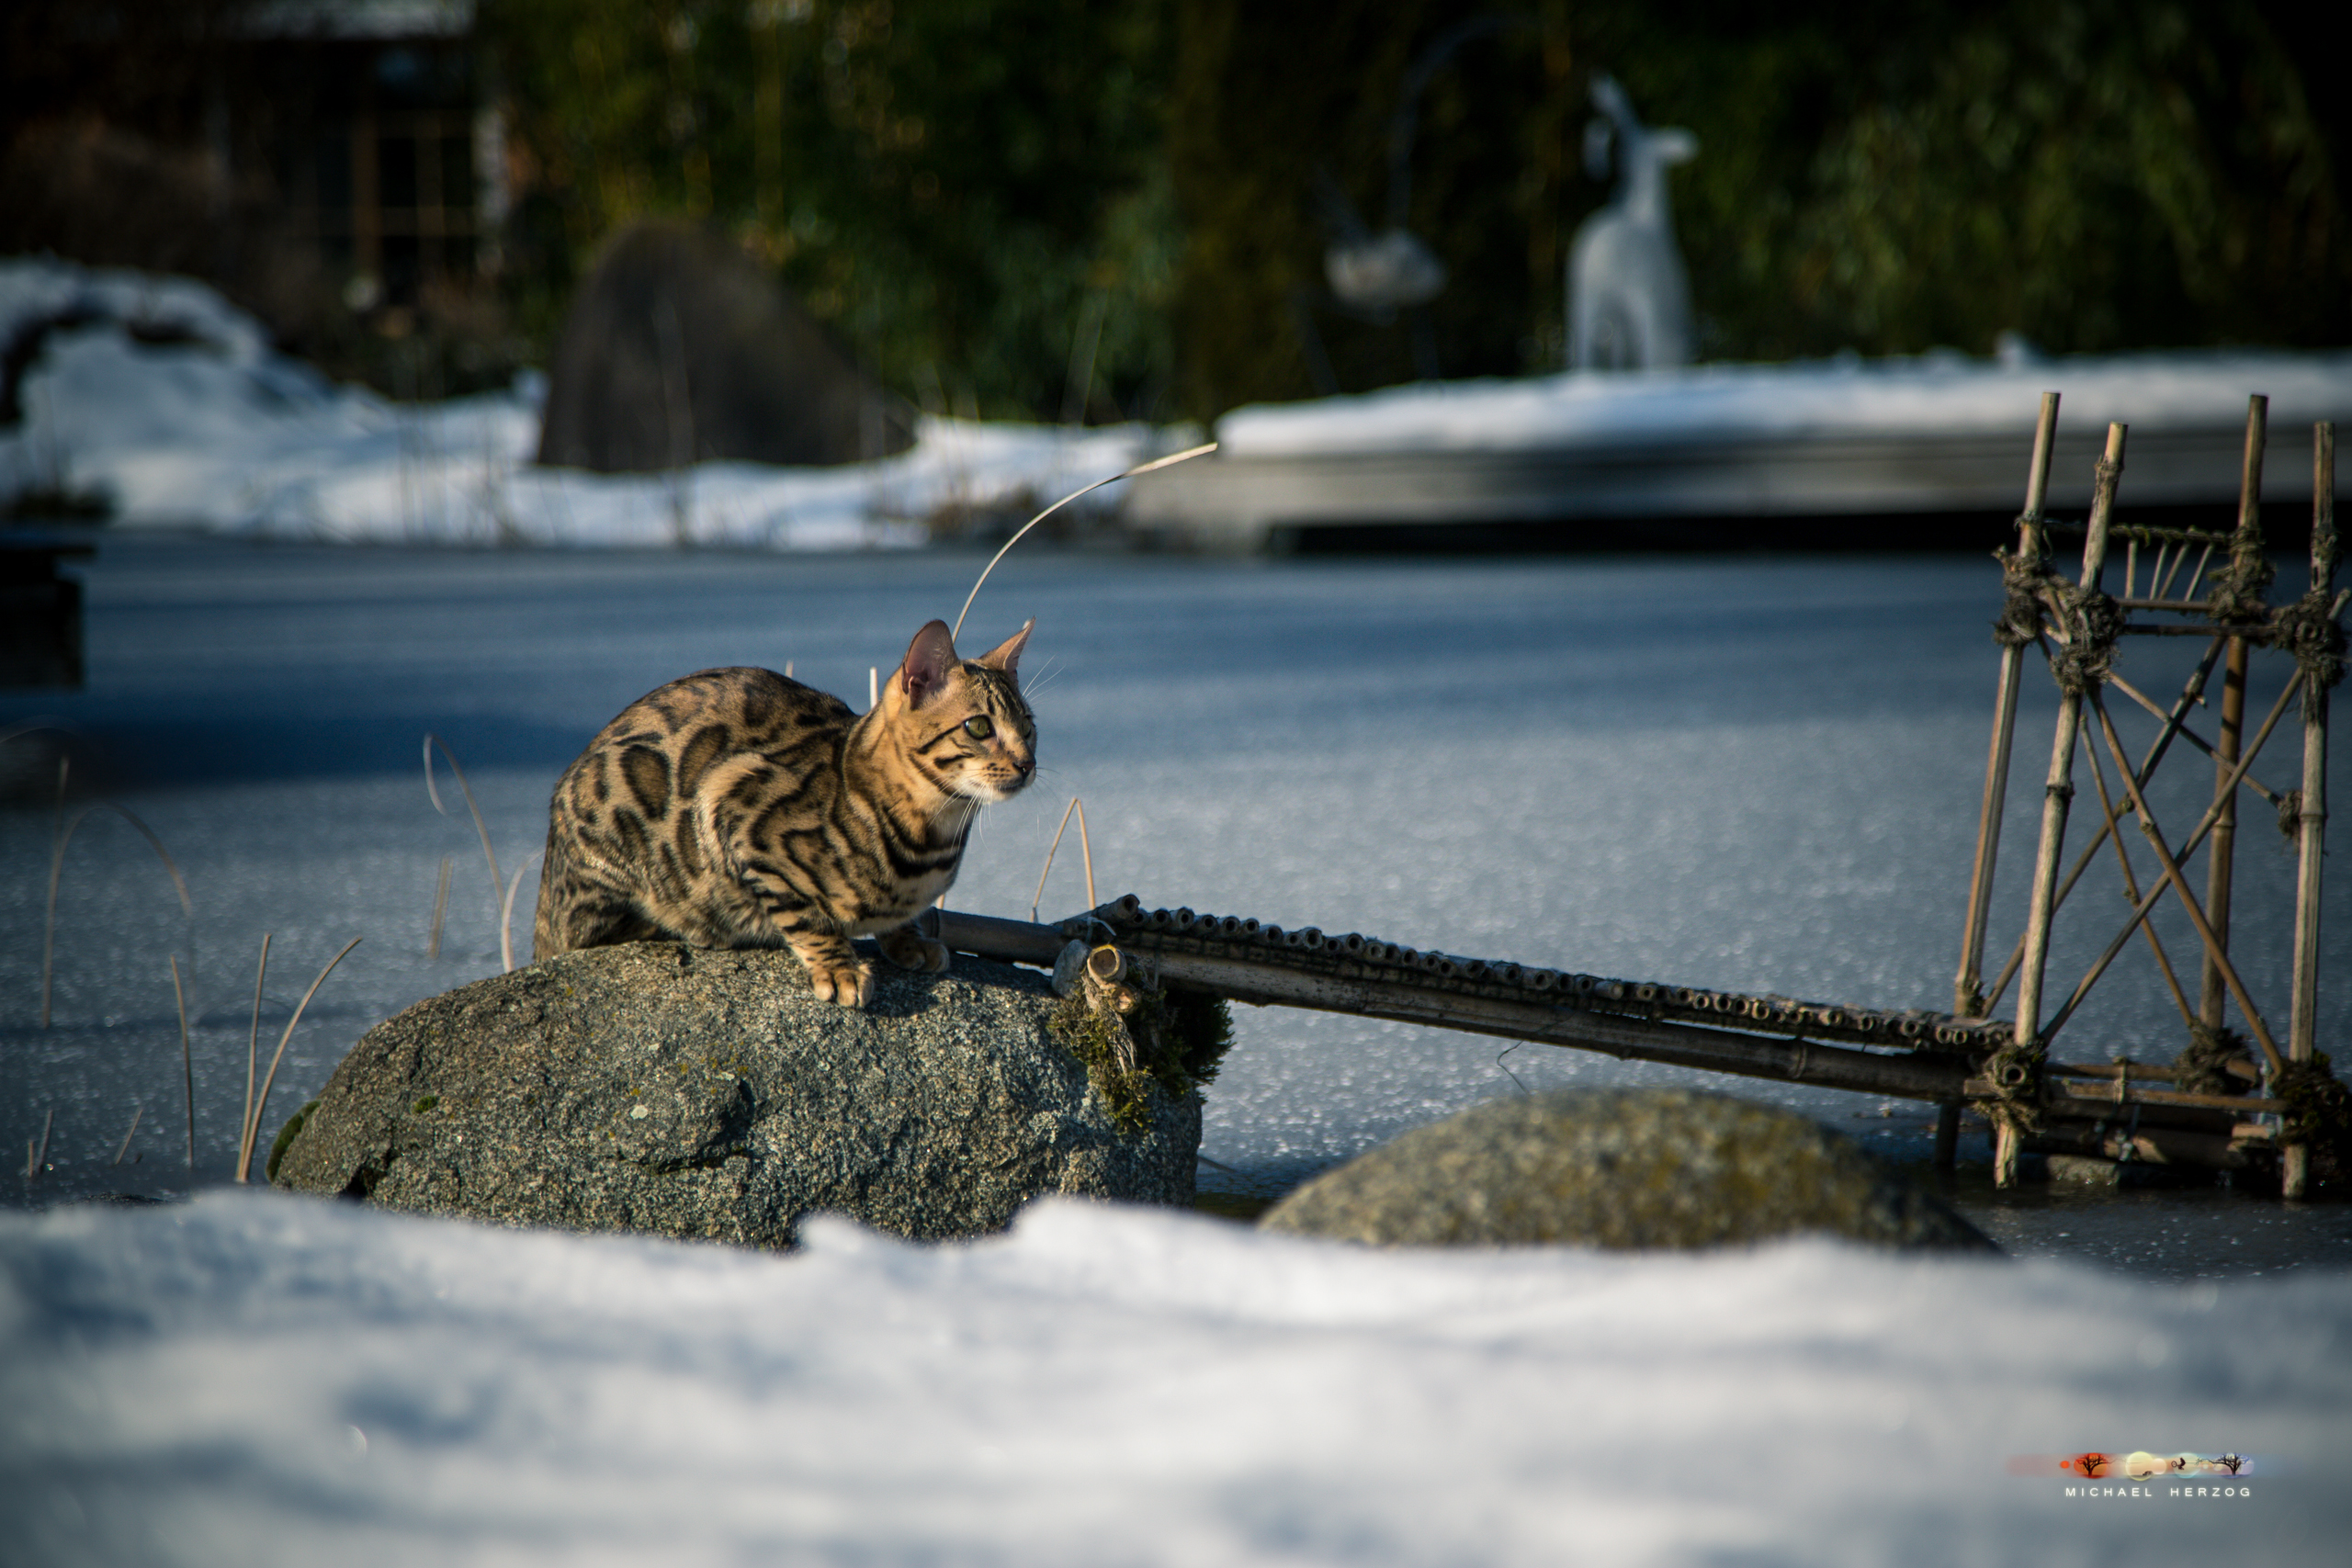 BALUARI_Winter2019_Garten_MichaelHerzog-8387.jpg